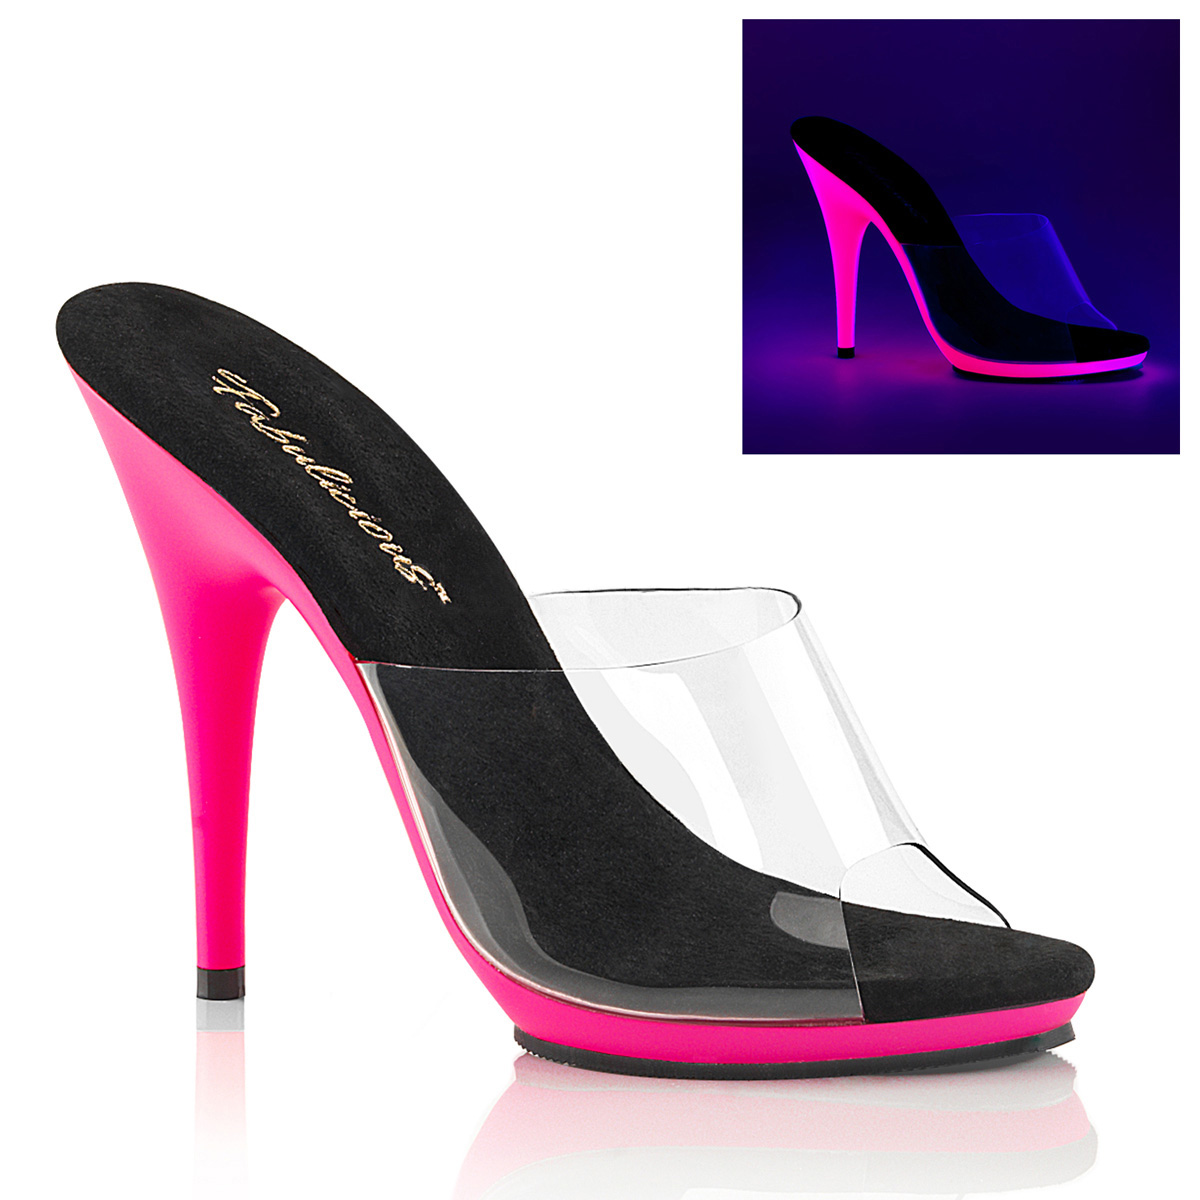 Pantoletten POISE-501UV Pink Neon Pantolette POISE-501UV Pink